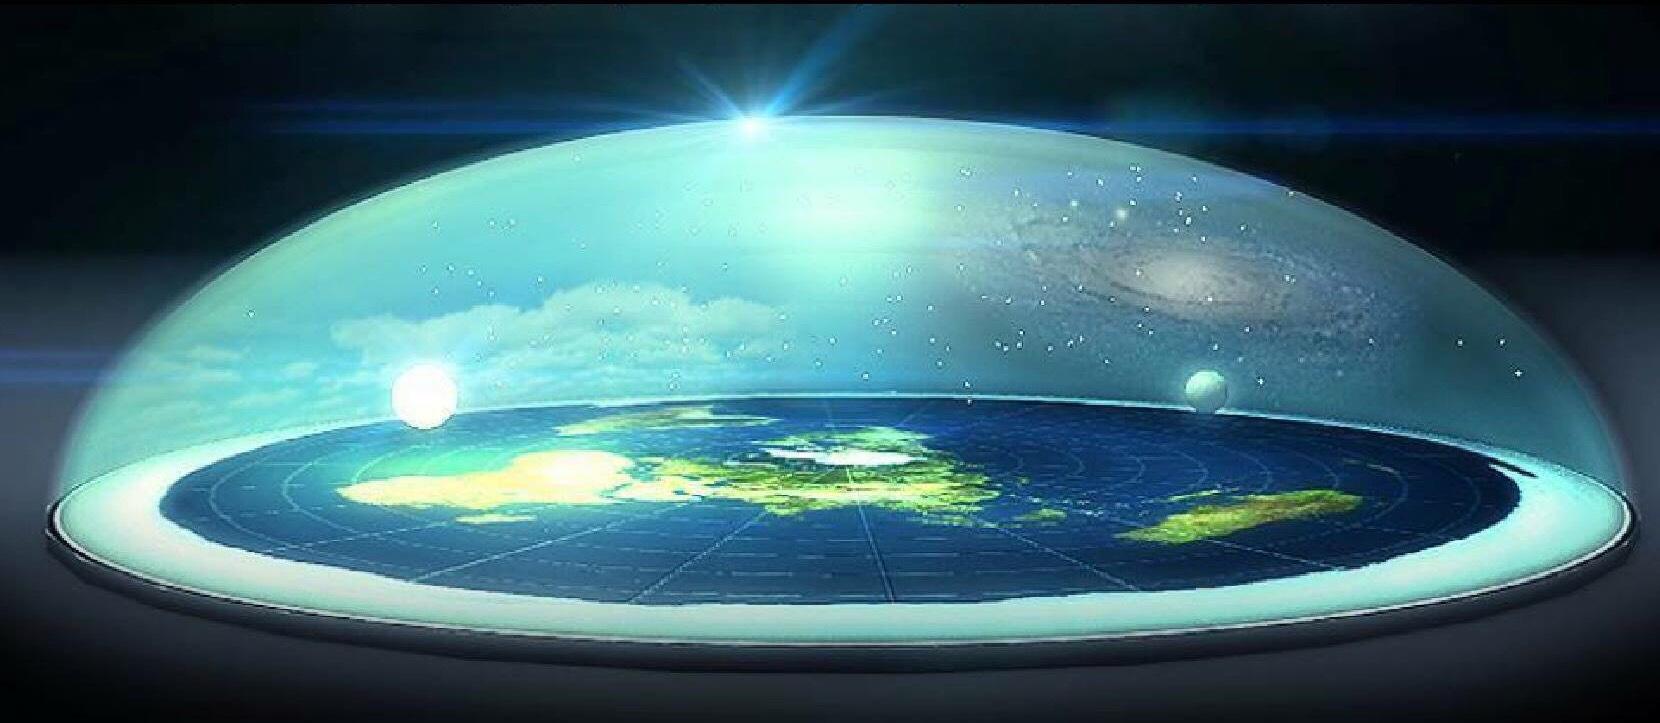 De Platte Aarde theorie, hoe zit dat dan?